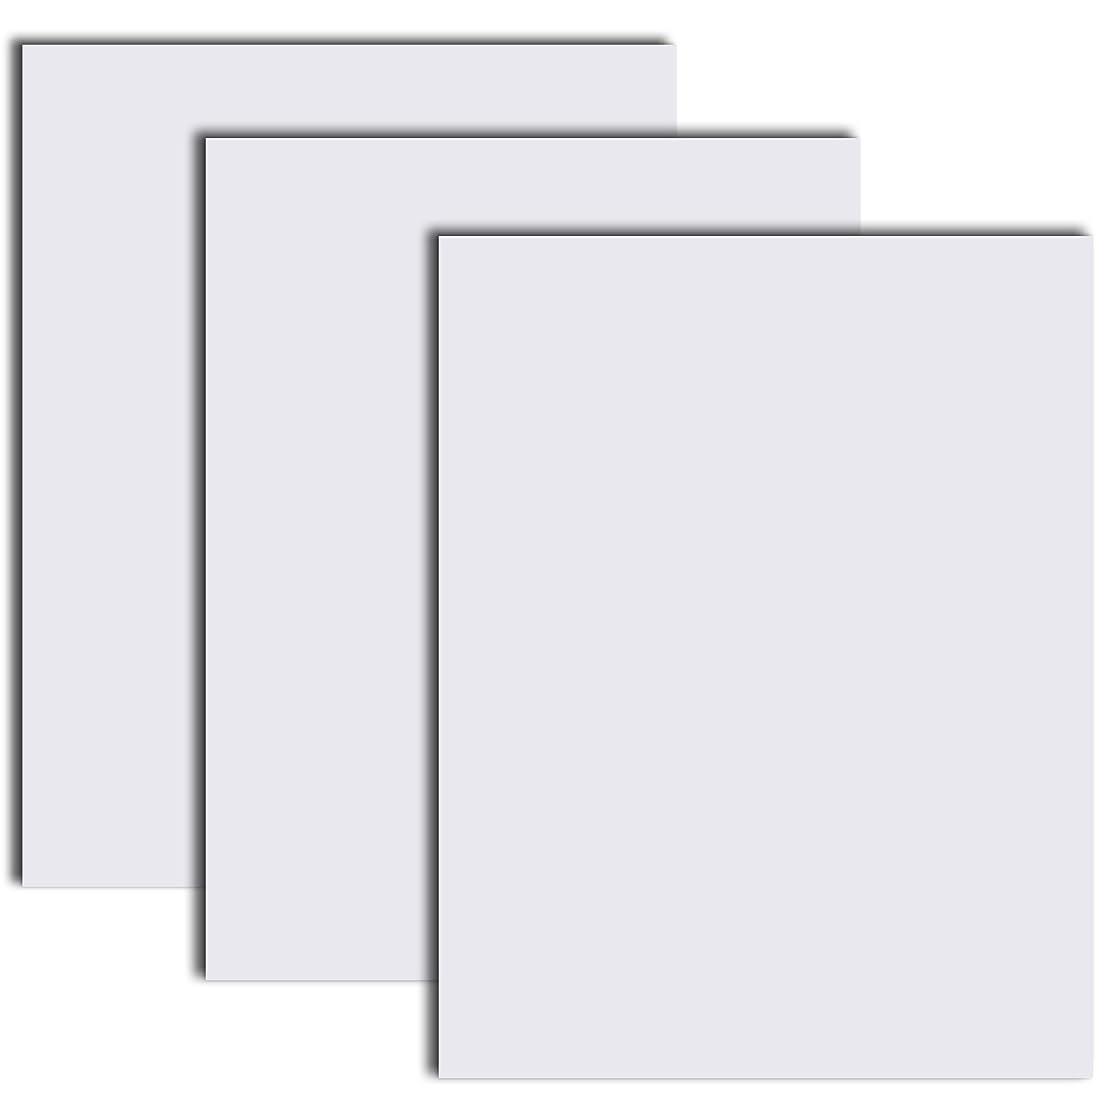 Siser EasyWeed Stretch Heat Transfer Vinyl HTV 3 Precut Sheets 12 x 15 (White)